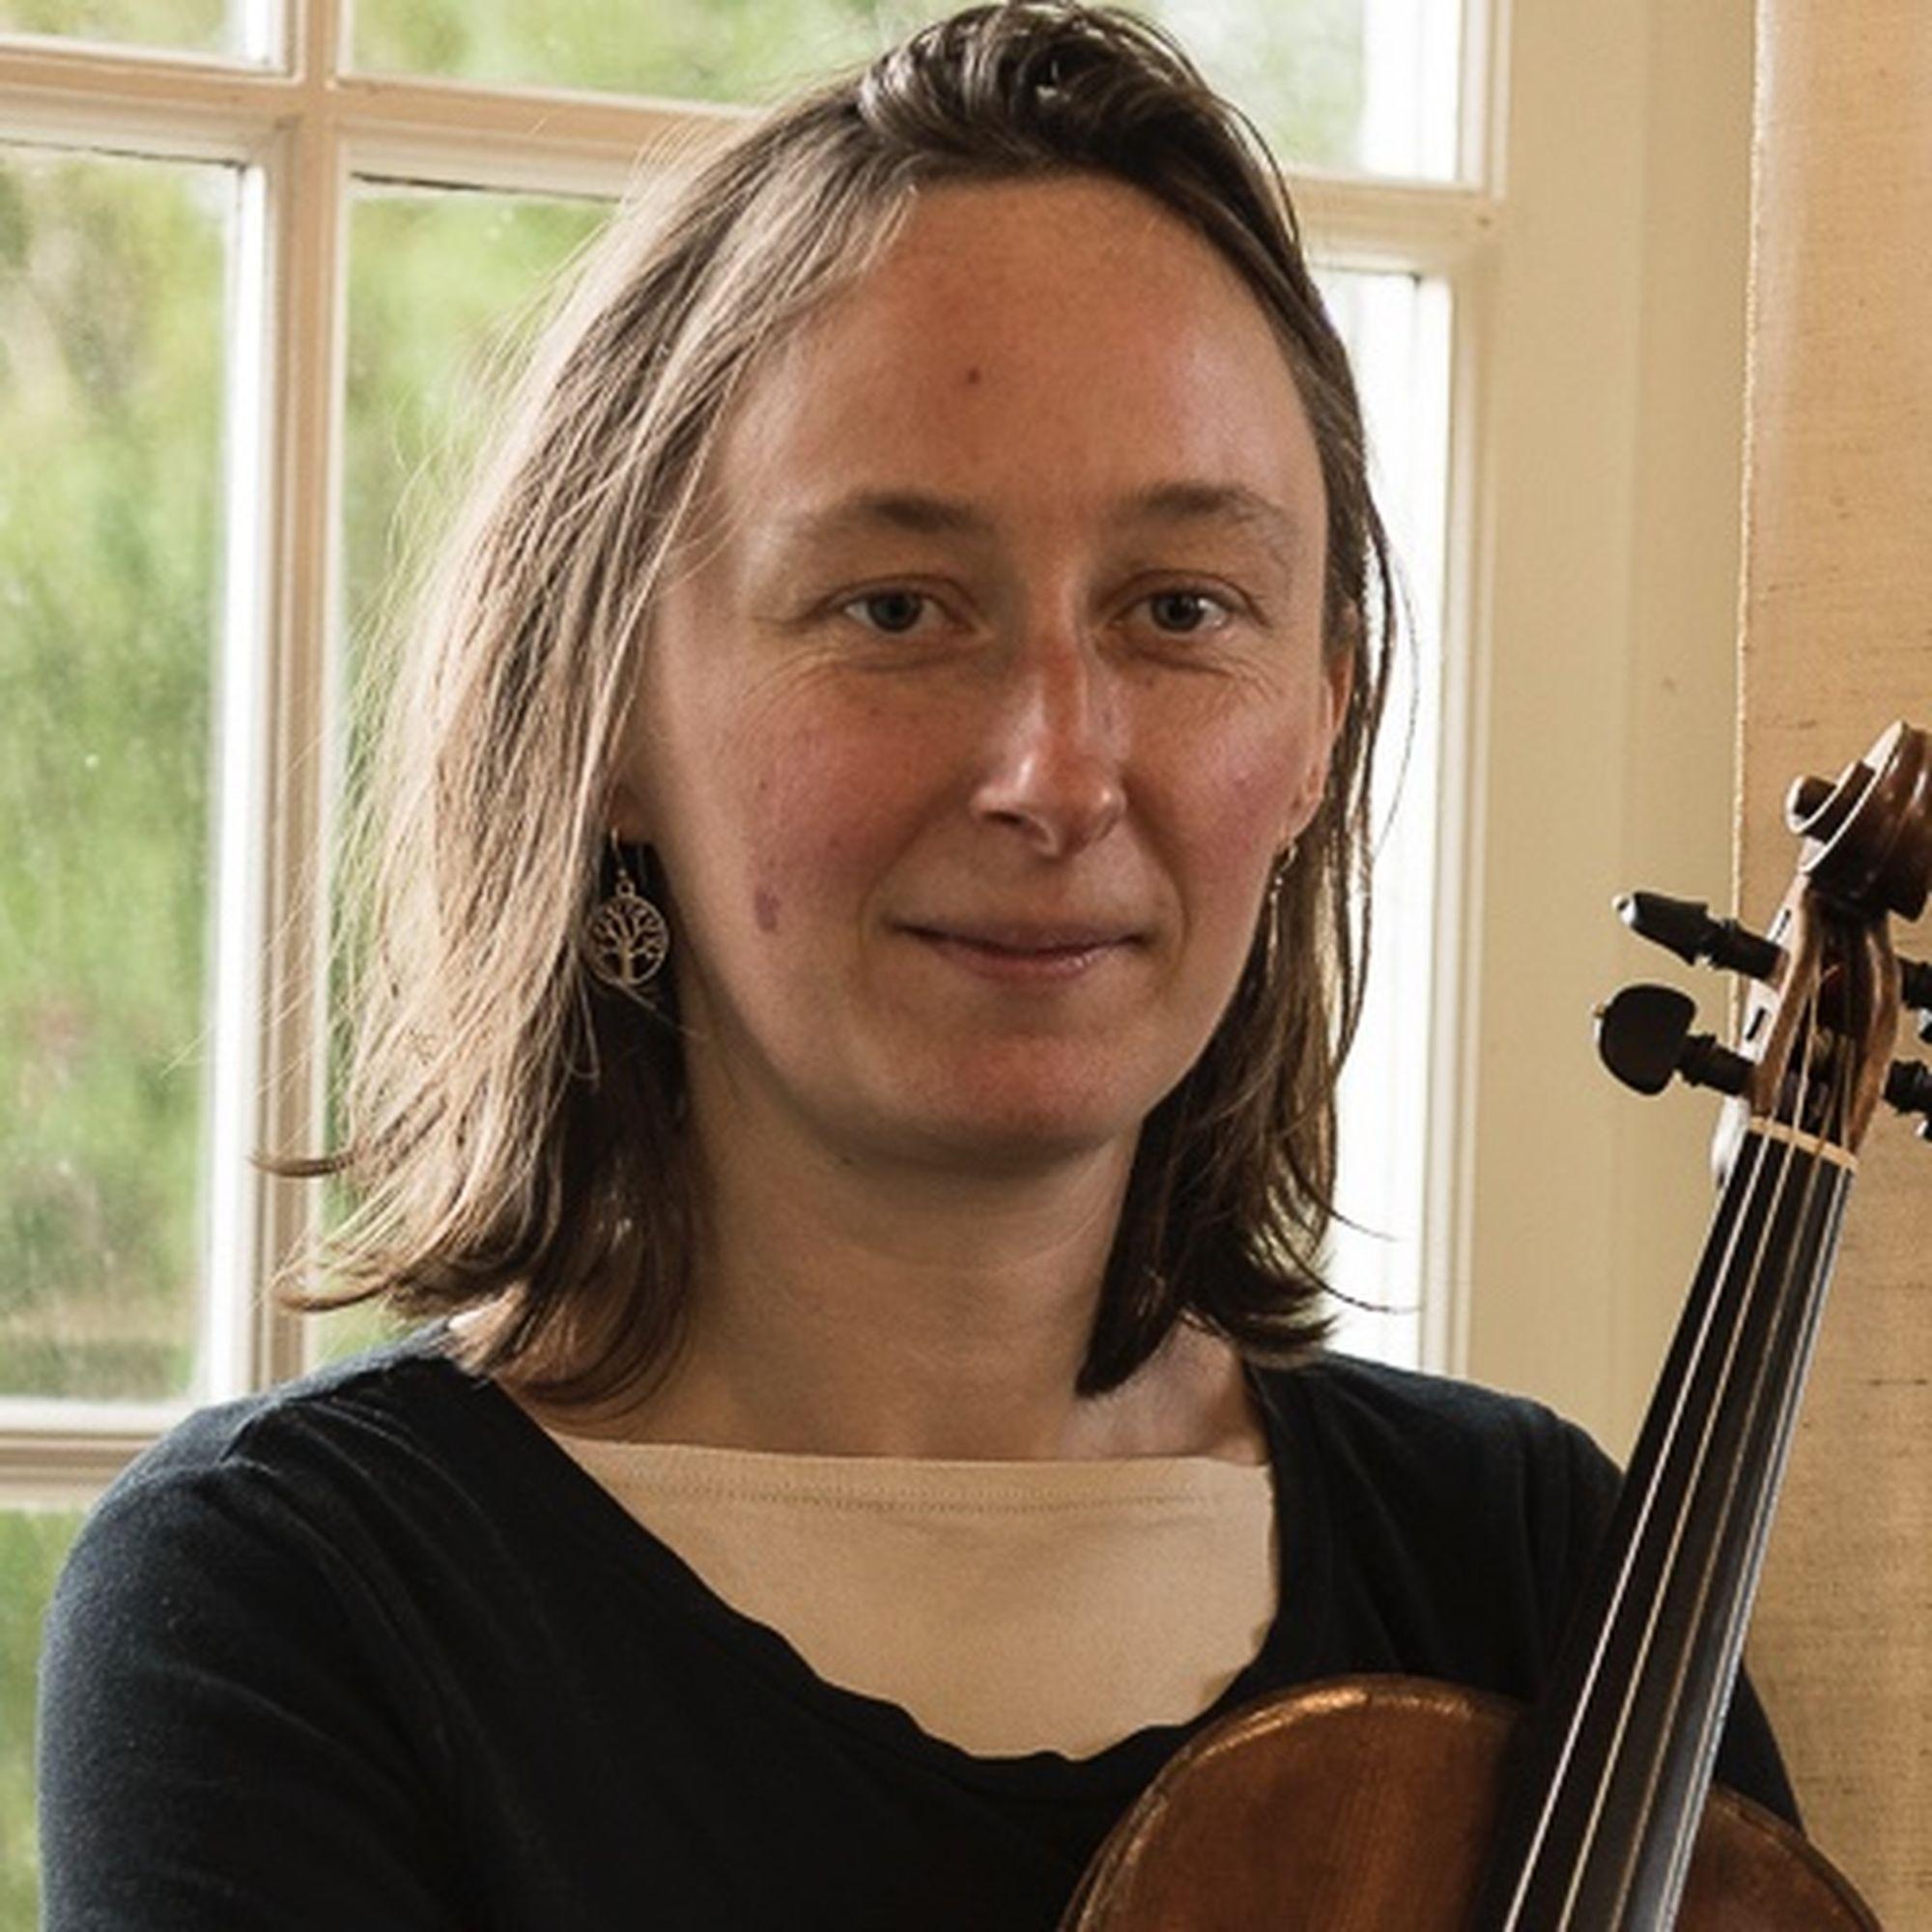 Ingrid Bourgeois